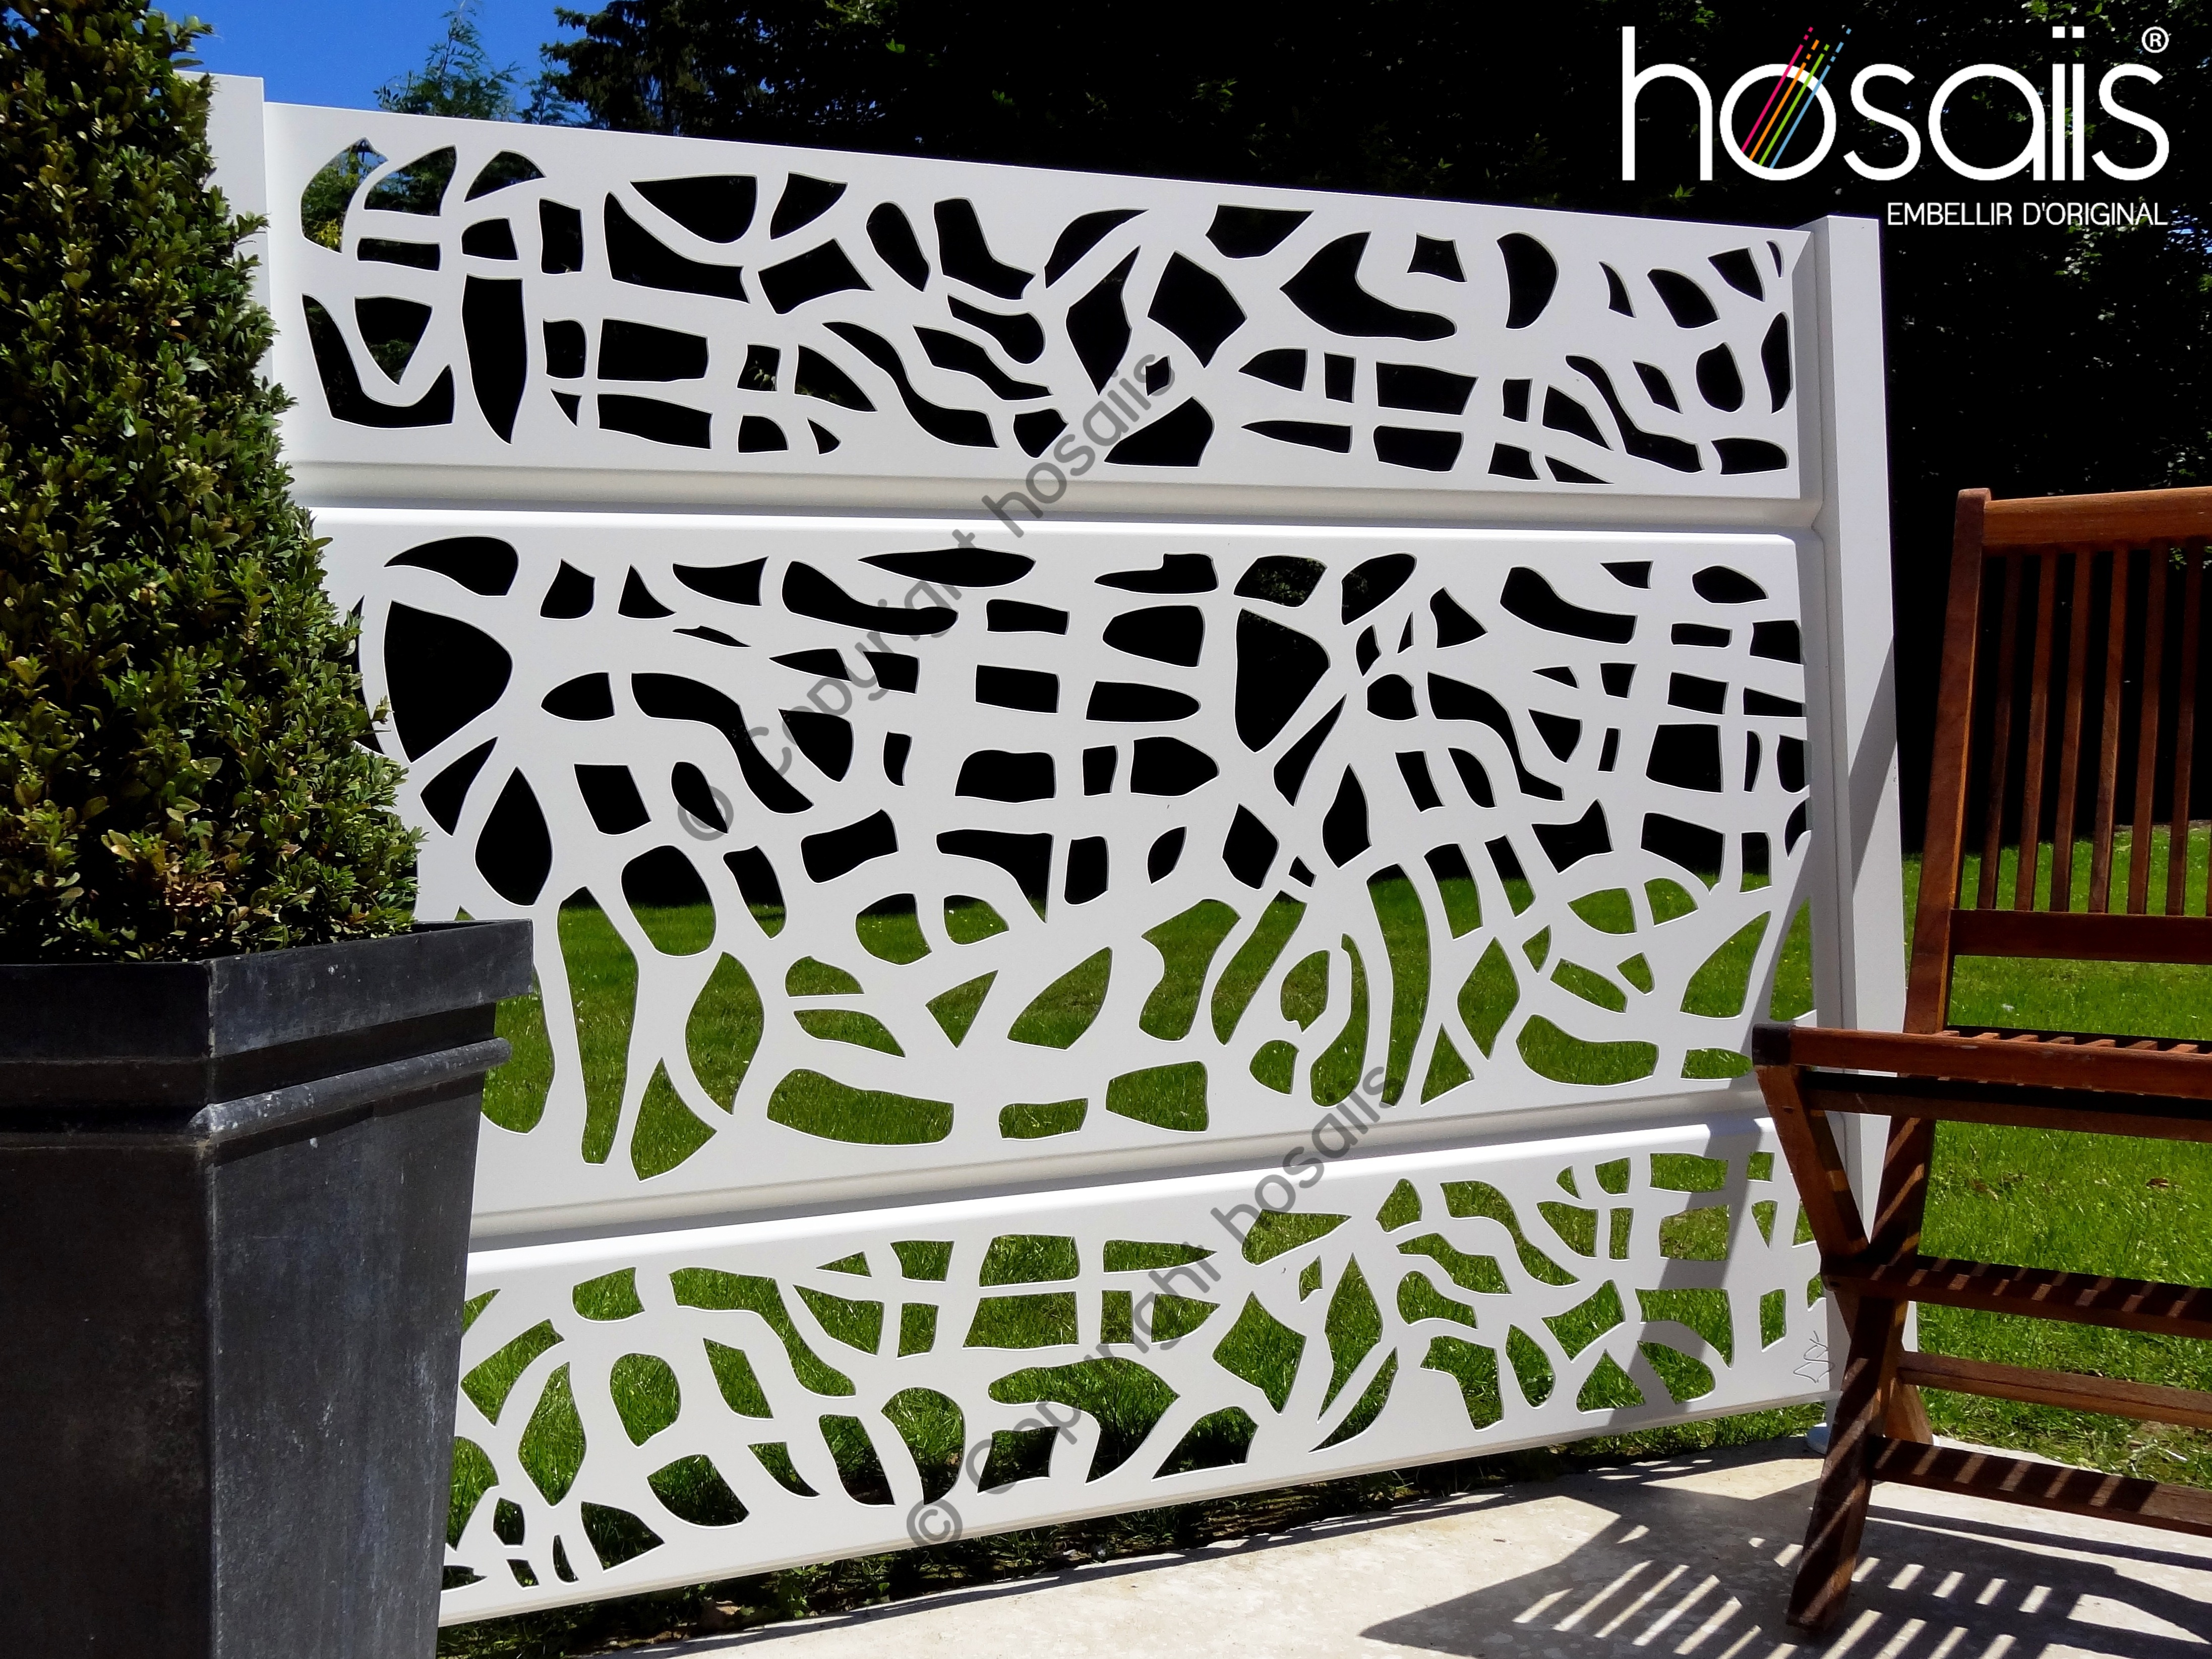 artlaser hosaiis brise vue hosaiis d coup laser alu. Black Bedroom Furniture Sets. Home Design Ideas